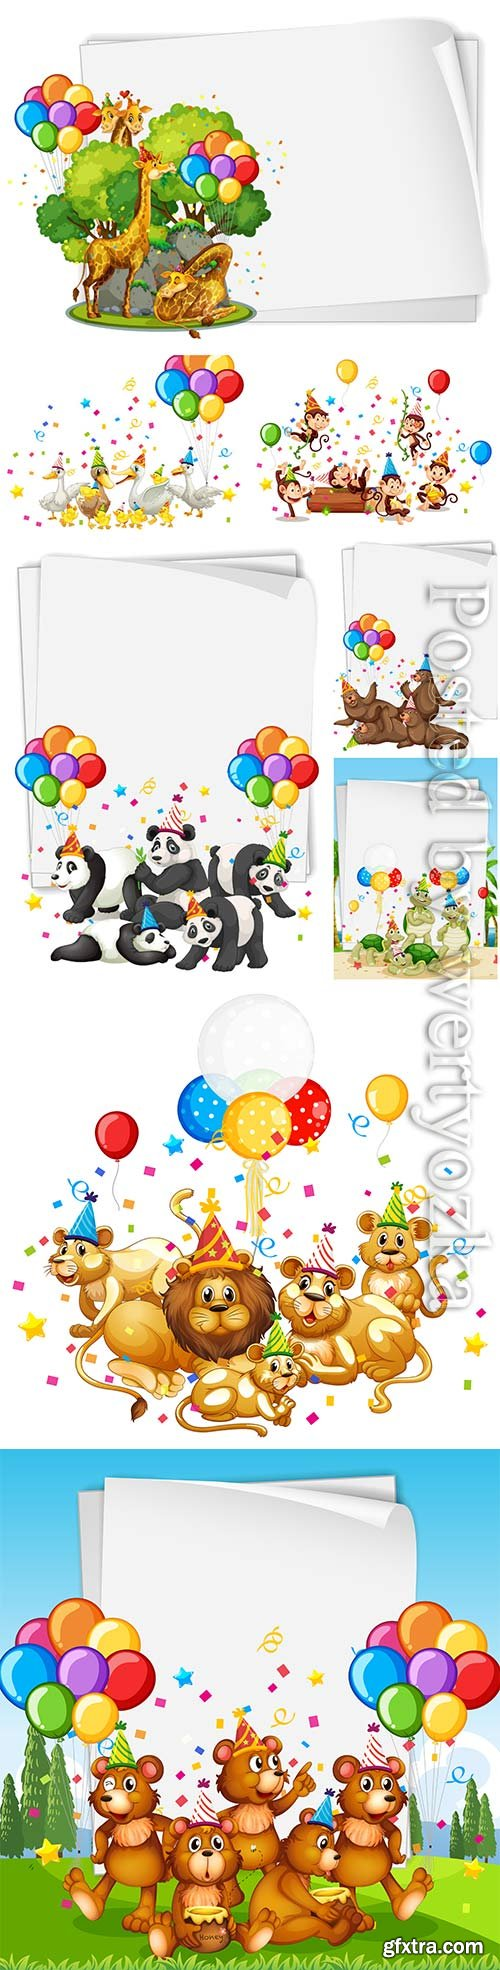 Cute animals in party theme premium vector